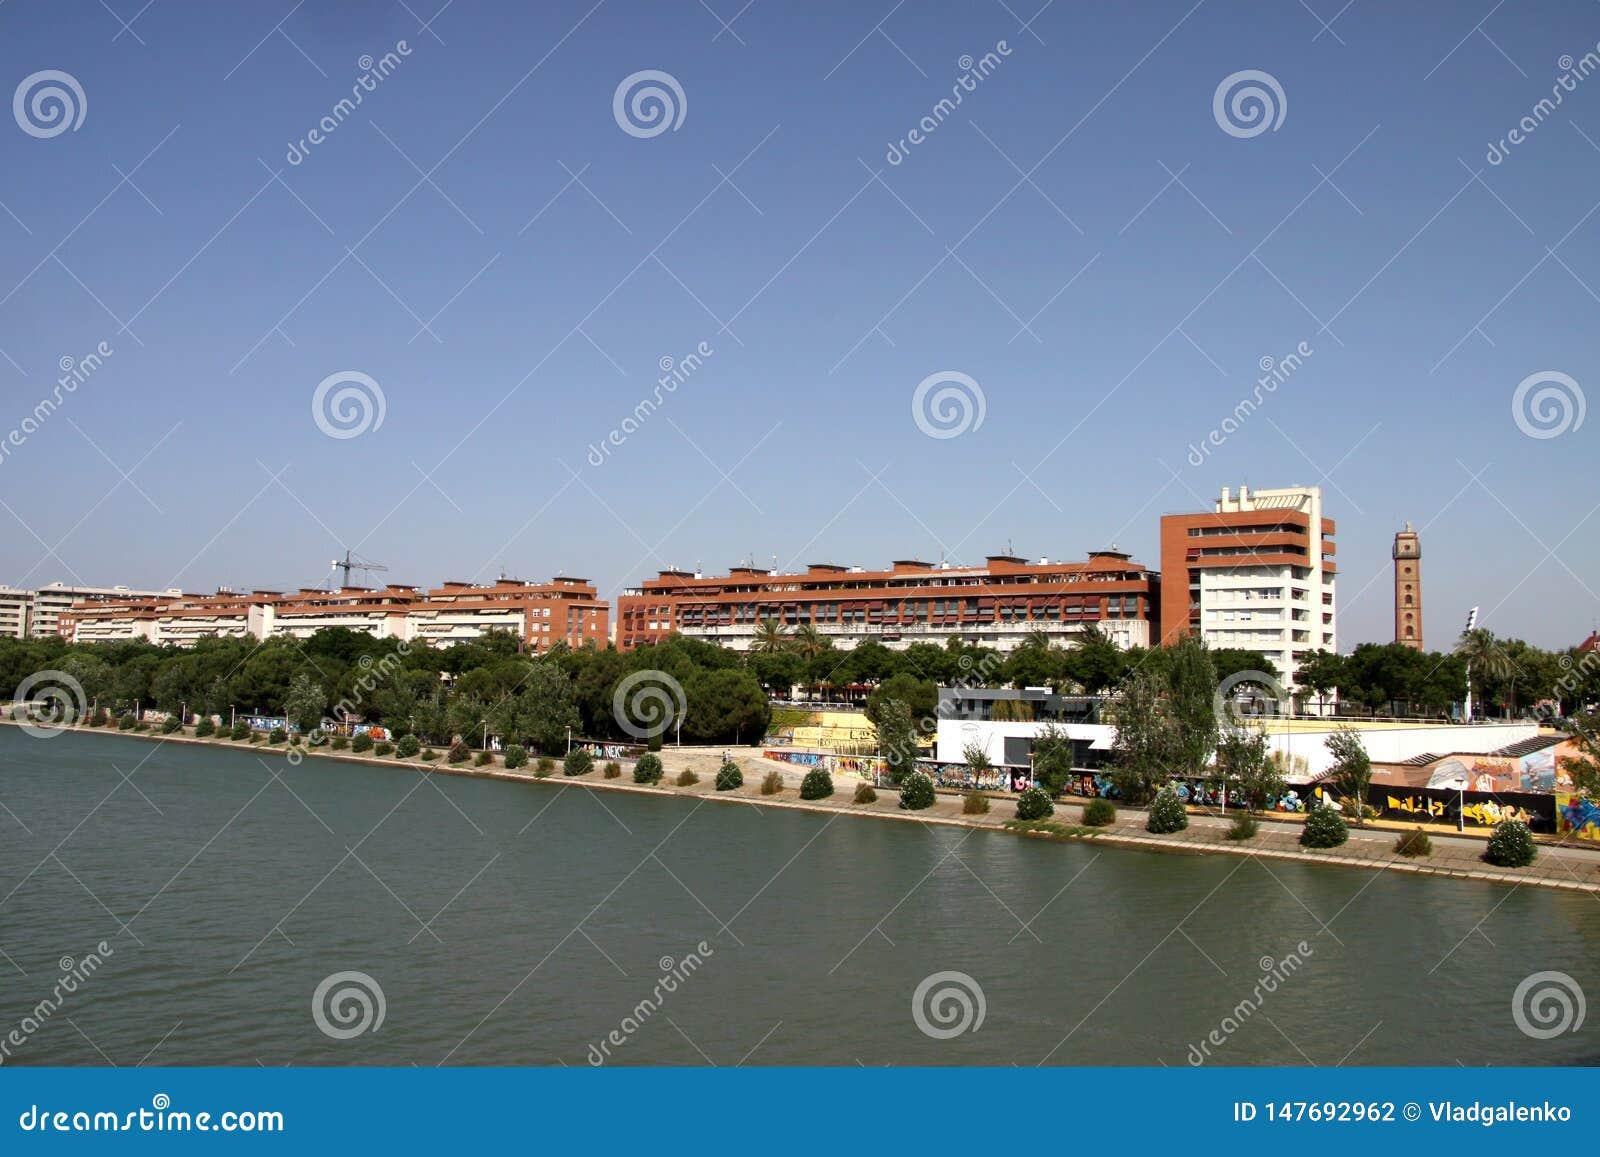 River Guadalquivir passing through the city of Seville